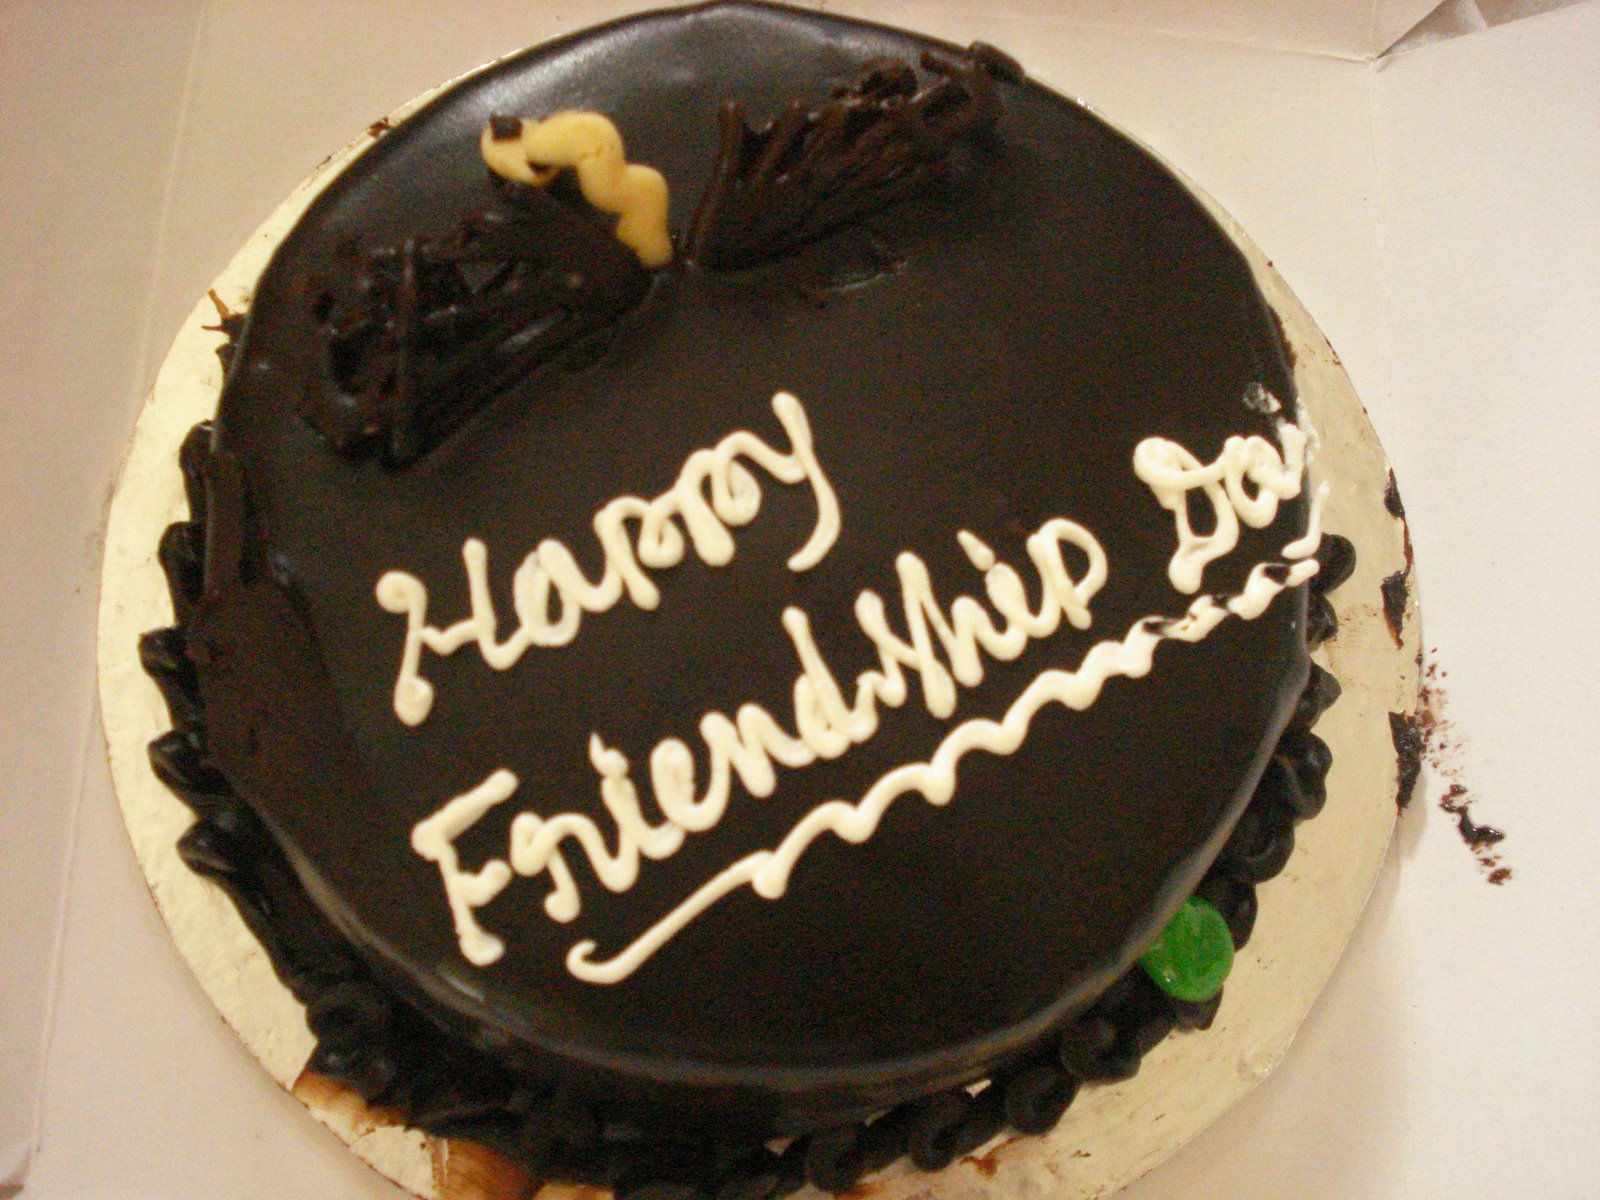 Happy friendship day cake Wallpaper